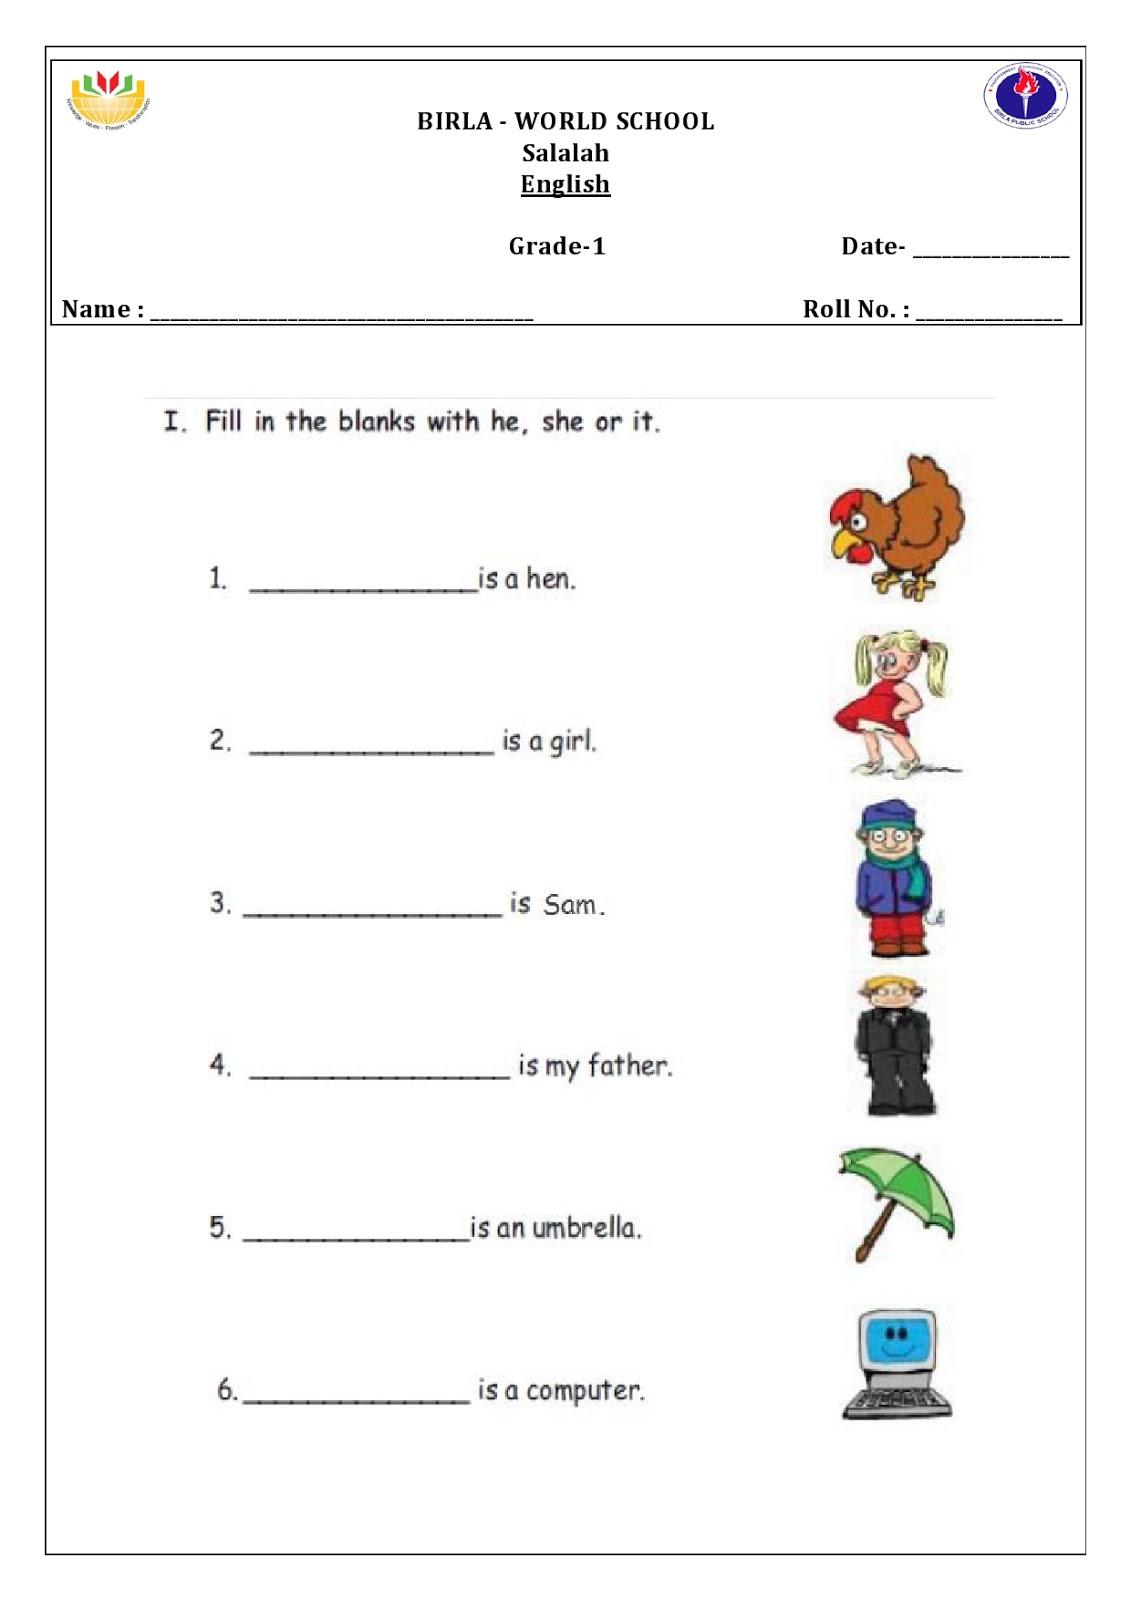 Worksheets For Grade 1 Cbse